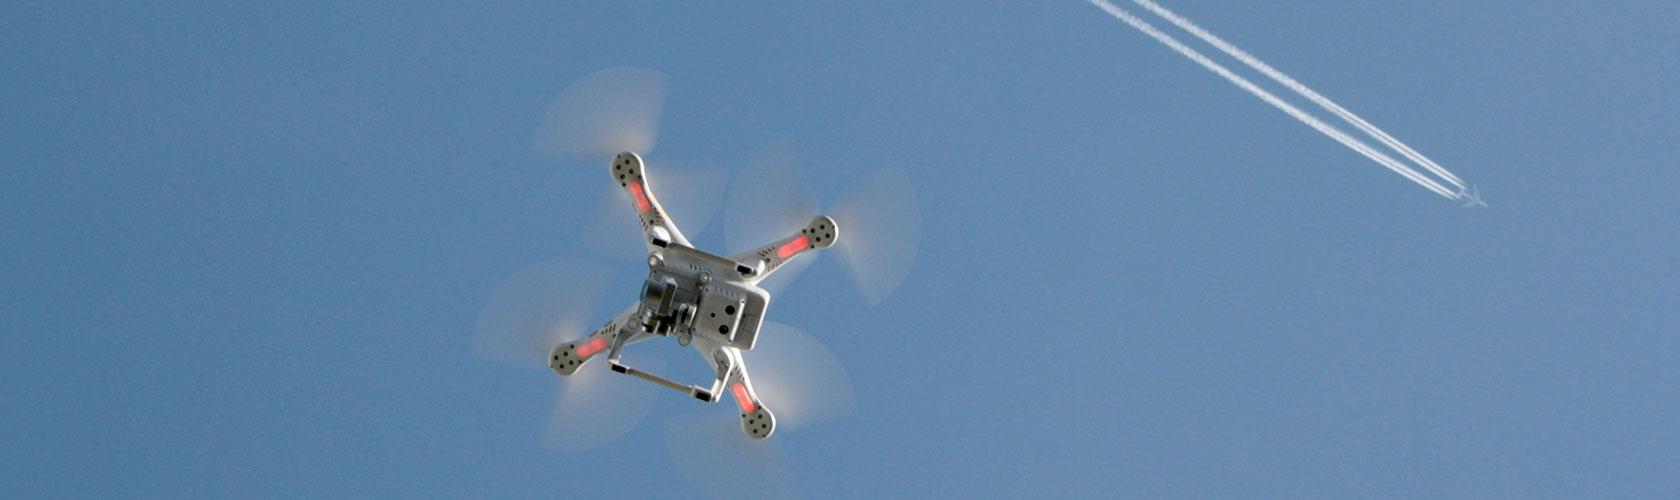 Drohnenüberwachung Contentbild